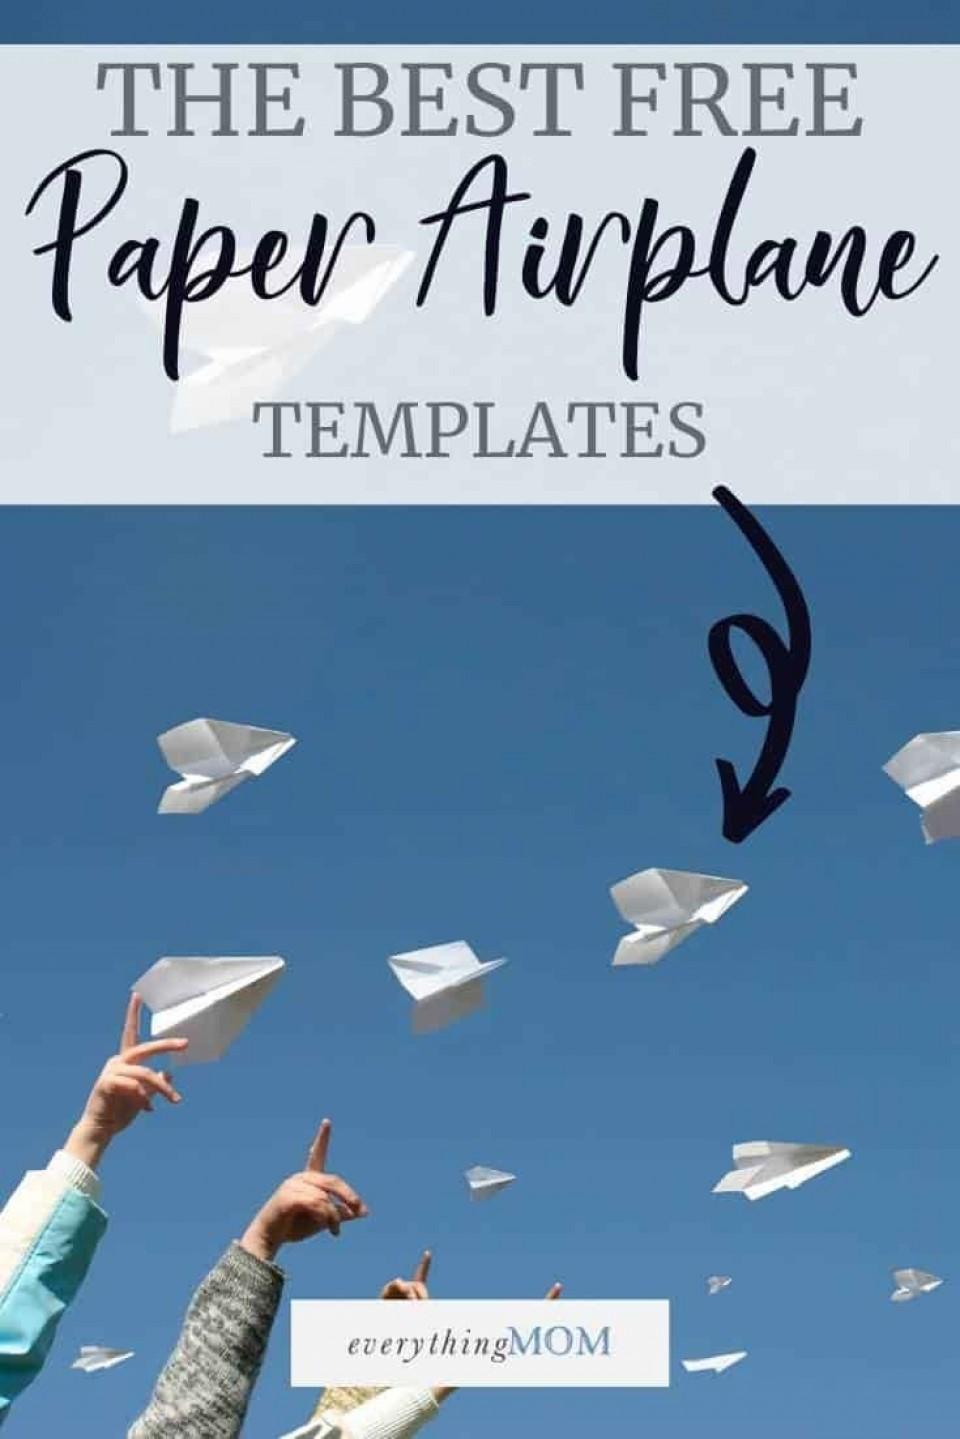 000 Fearsome Printable Paper Plane Plan Image  Free Airplane Template Pdf960